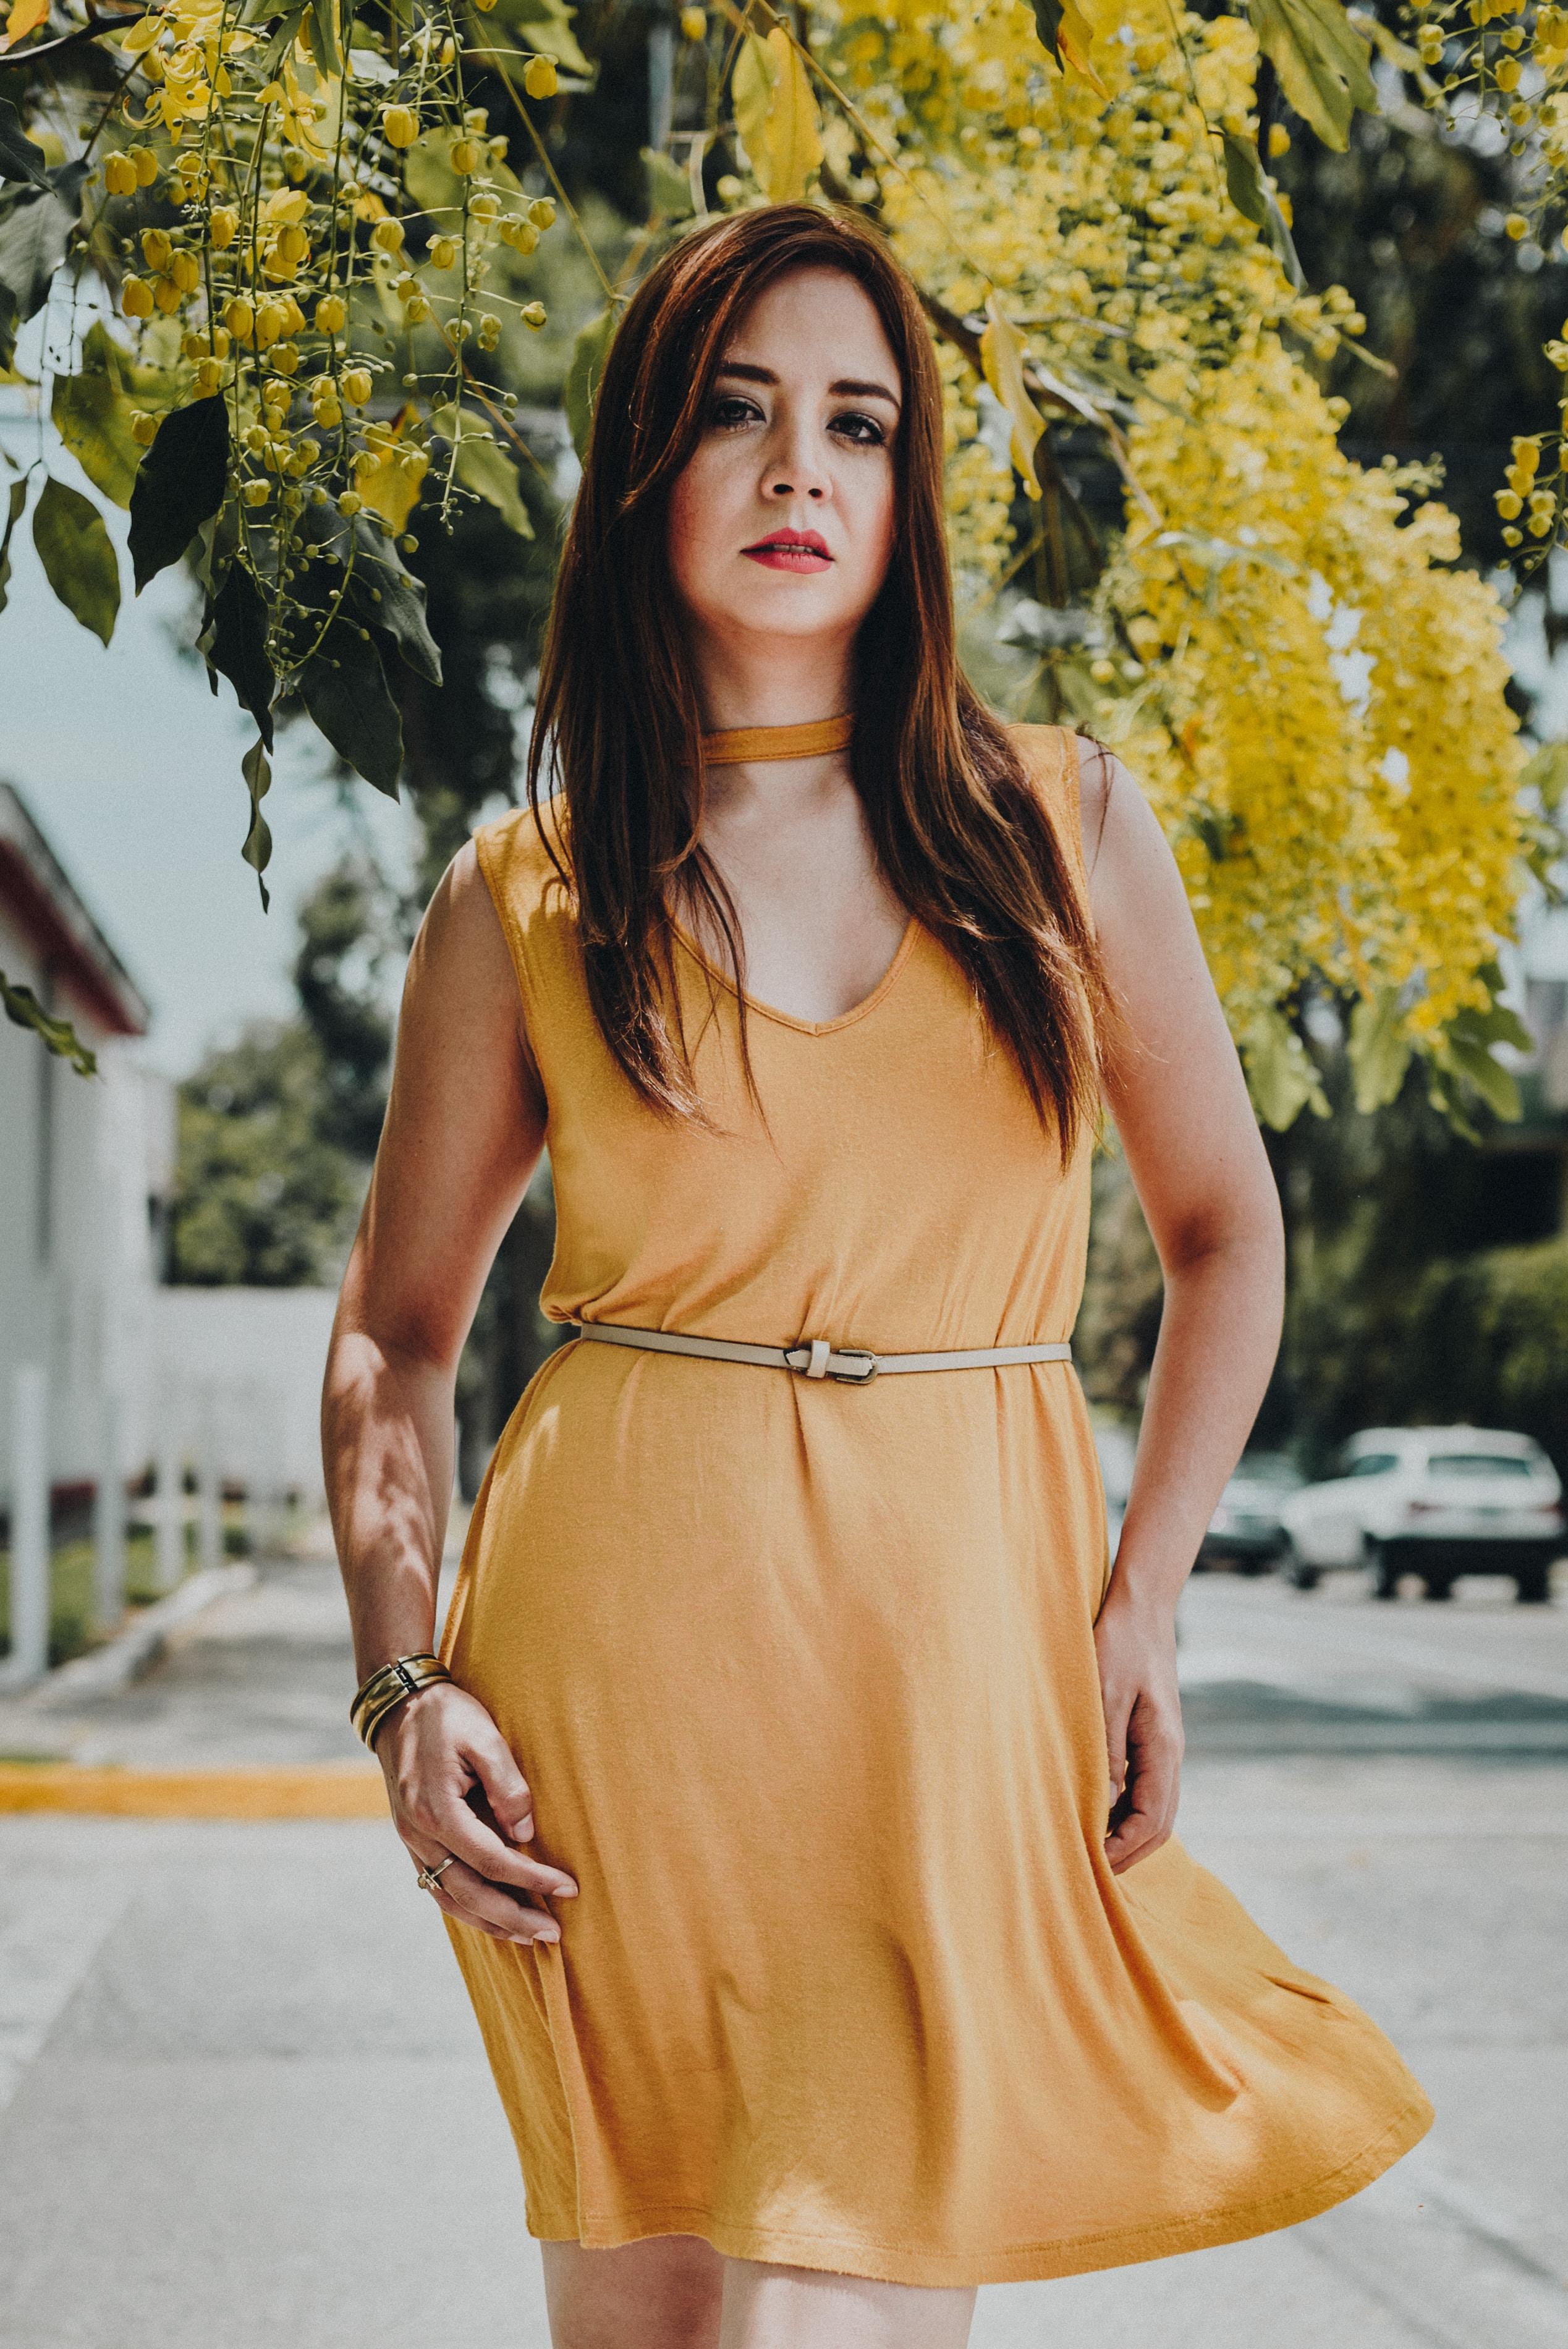 woman wearing orange sleeveless dress standing near yellow flower tree